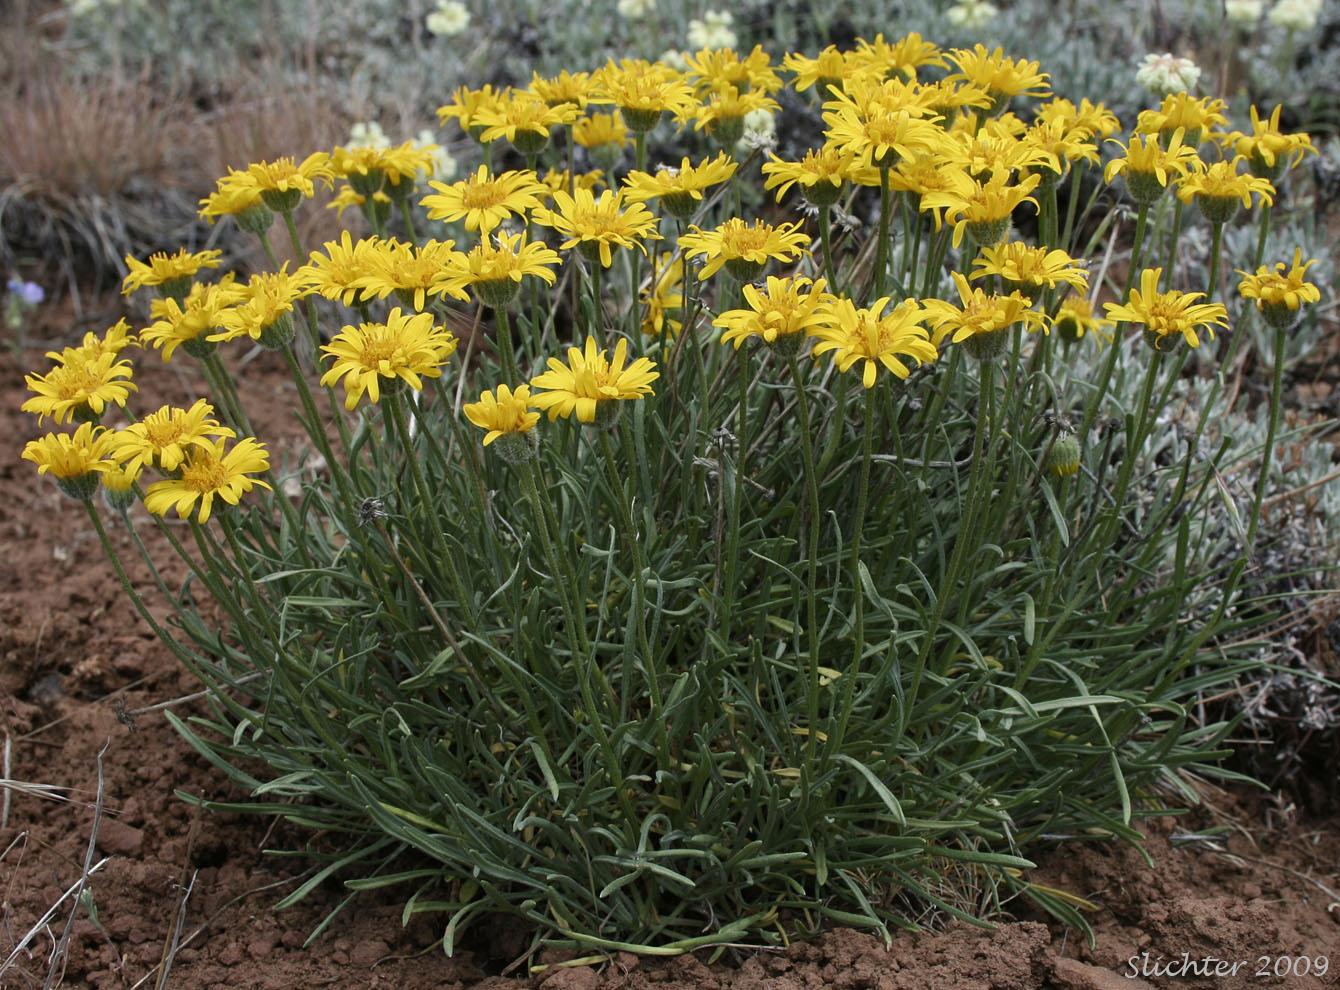 Desert yellow daisy yellow desert daisy desert yellow fleabane desert yellow daisy yellow desert daisy desert yellow fleabane lineleaf fleabane erigeron izmirmasajfo